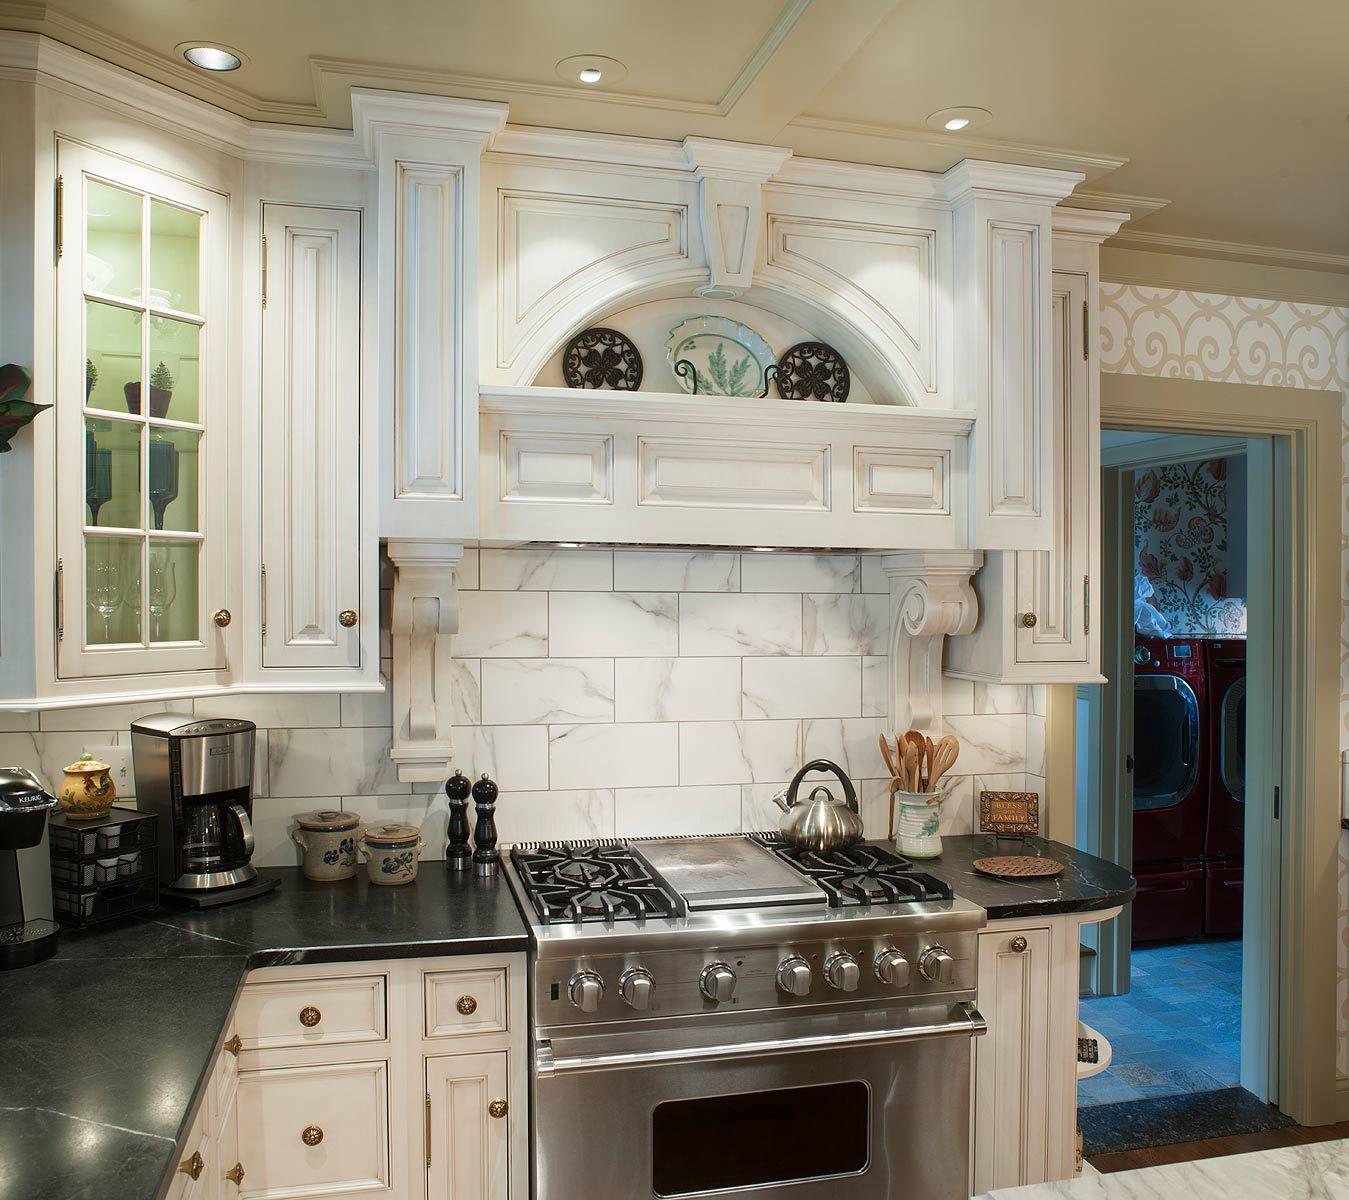 Photo 1 Amish Kitchen Cabinets Kitchen Cabinets Kitchen Design Small